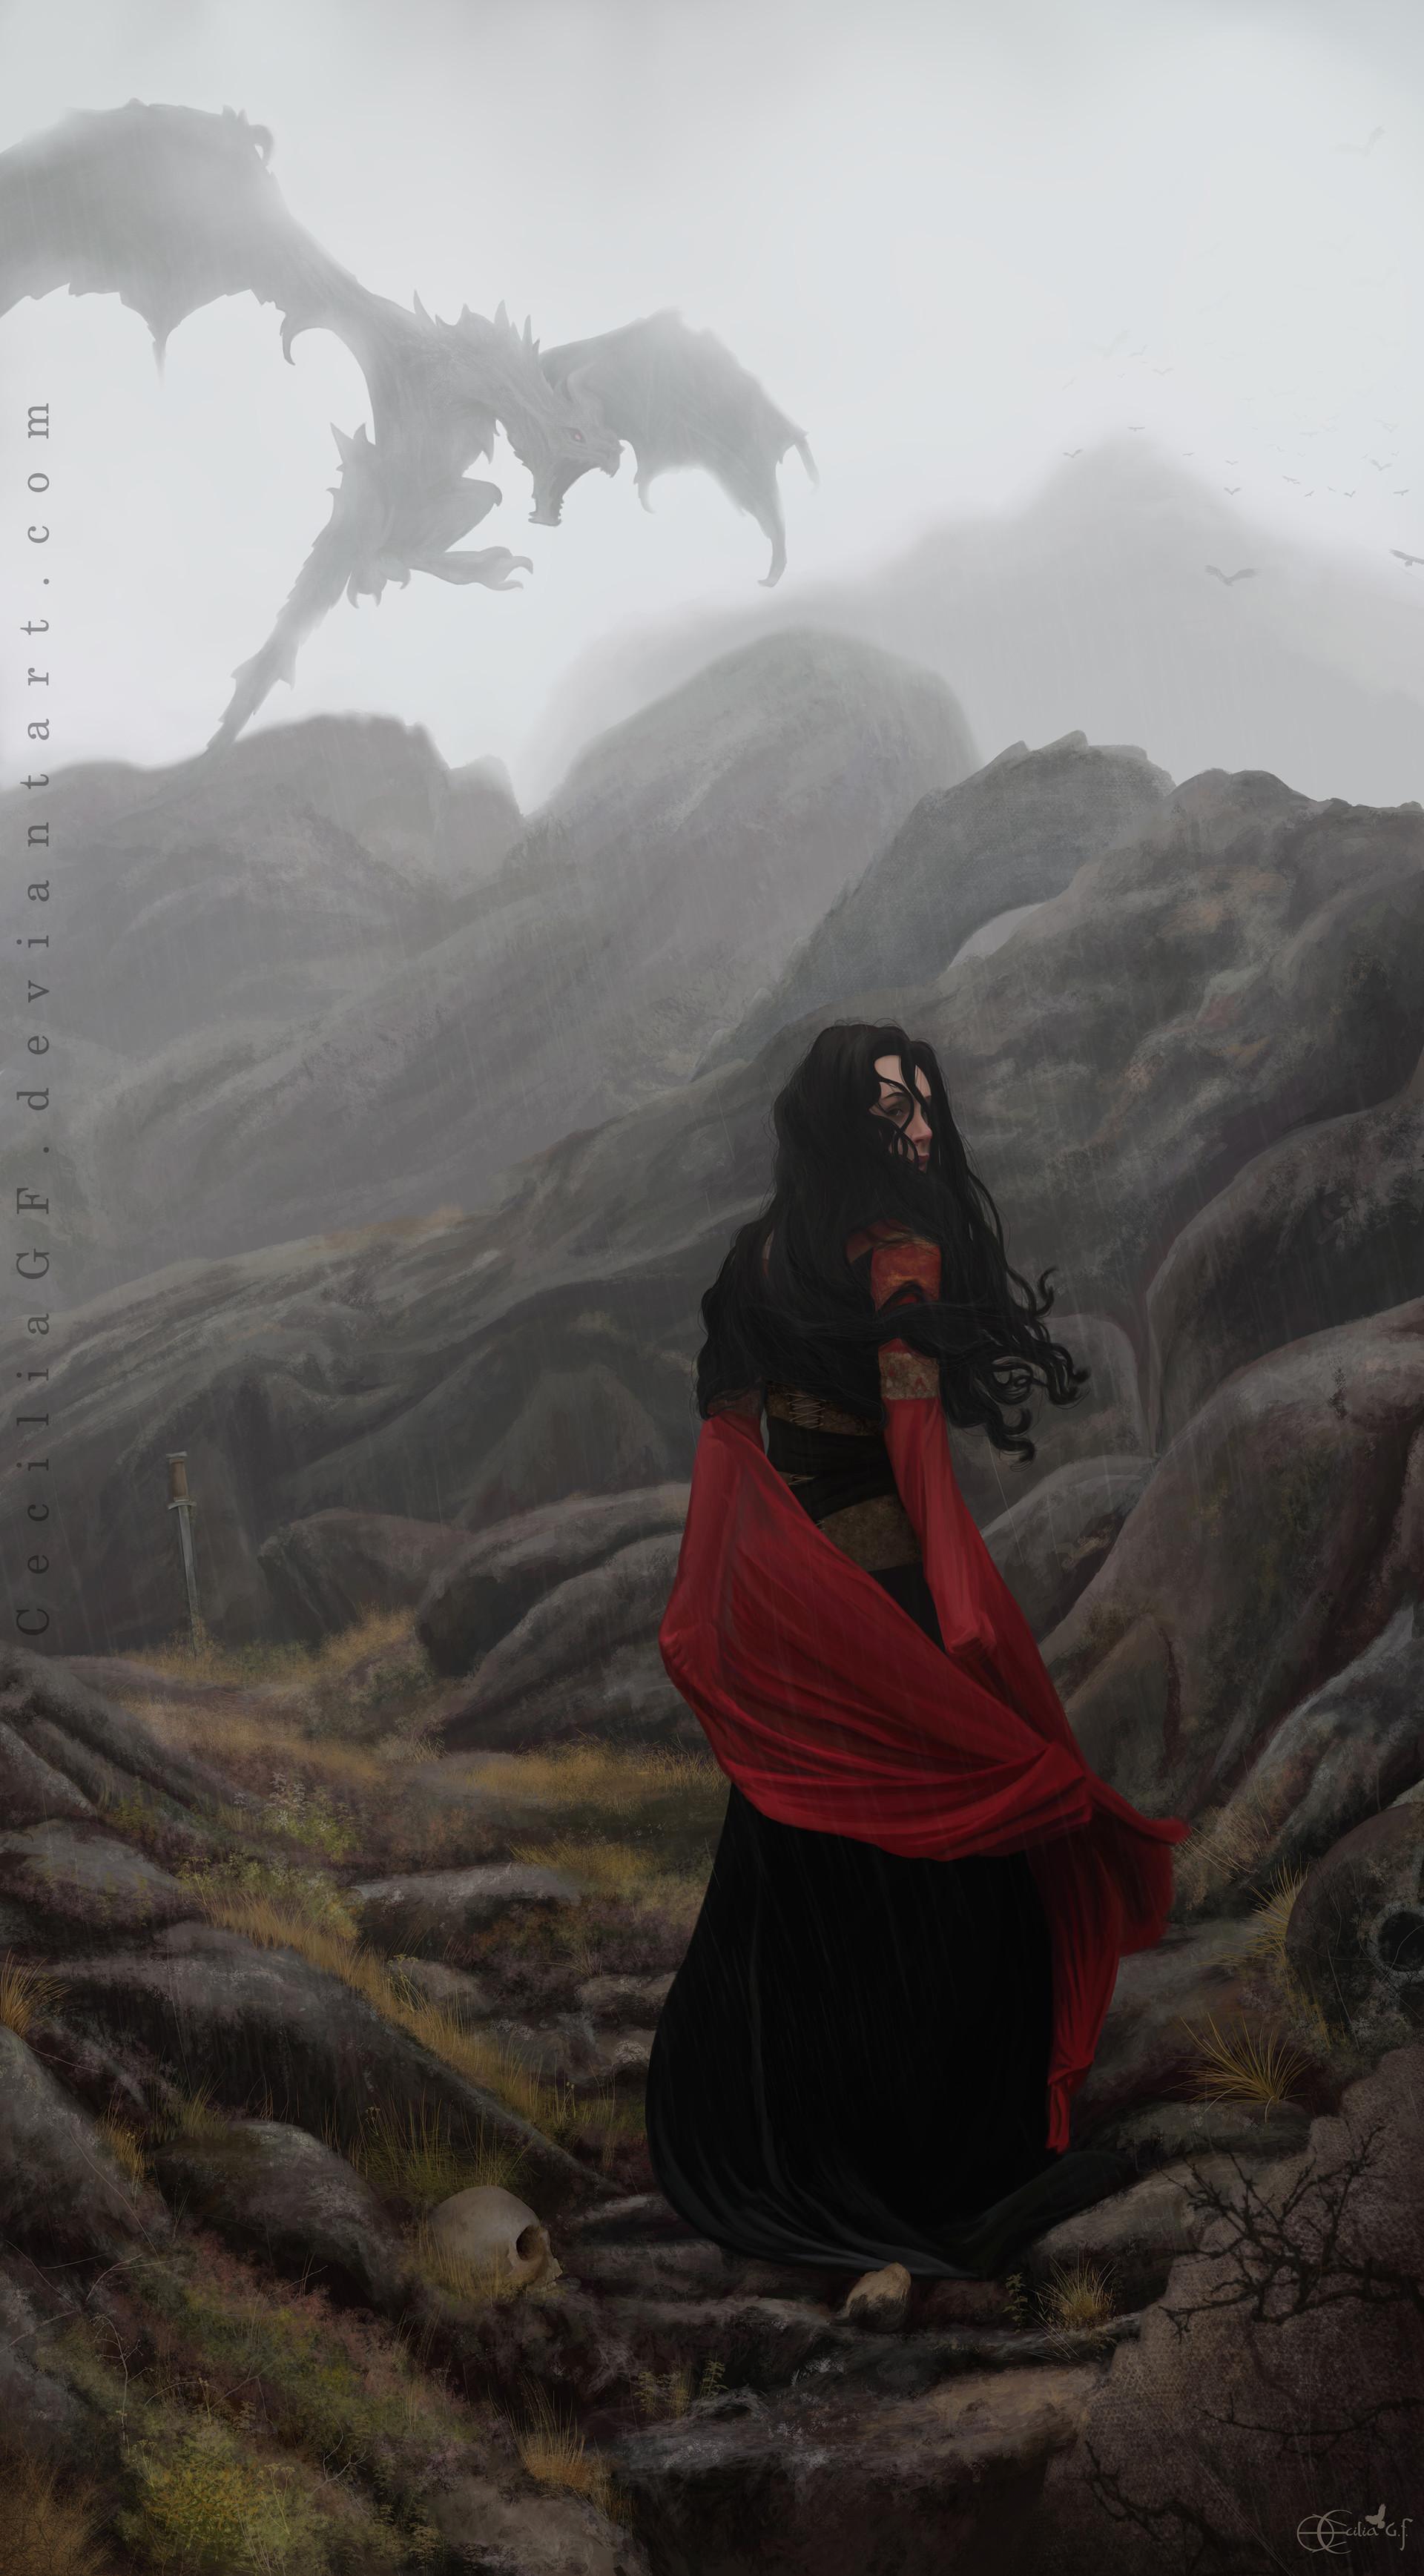 Cecilia g f calzada de dragones